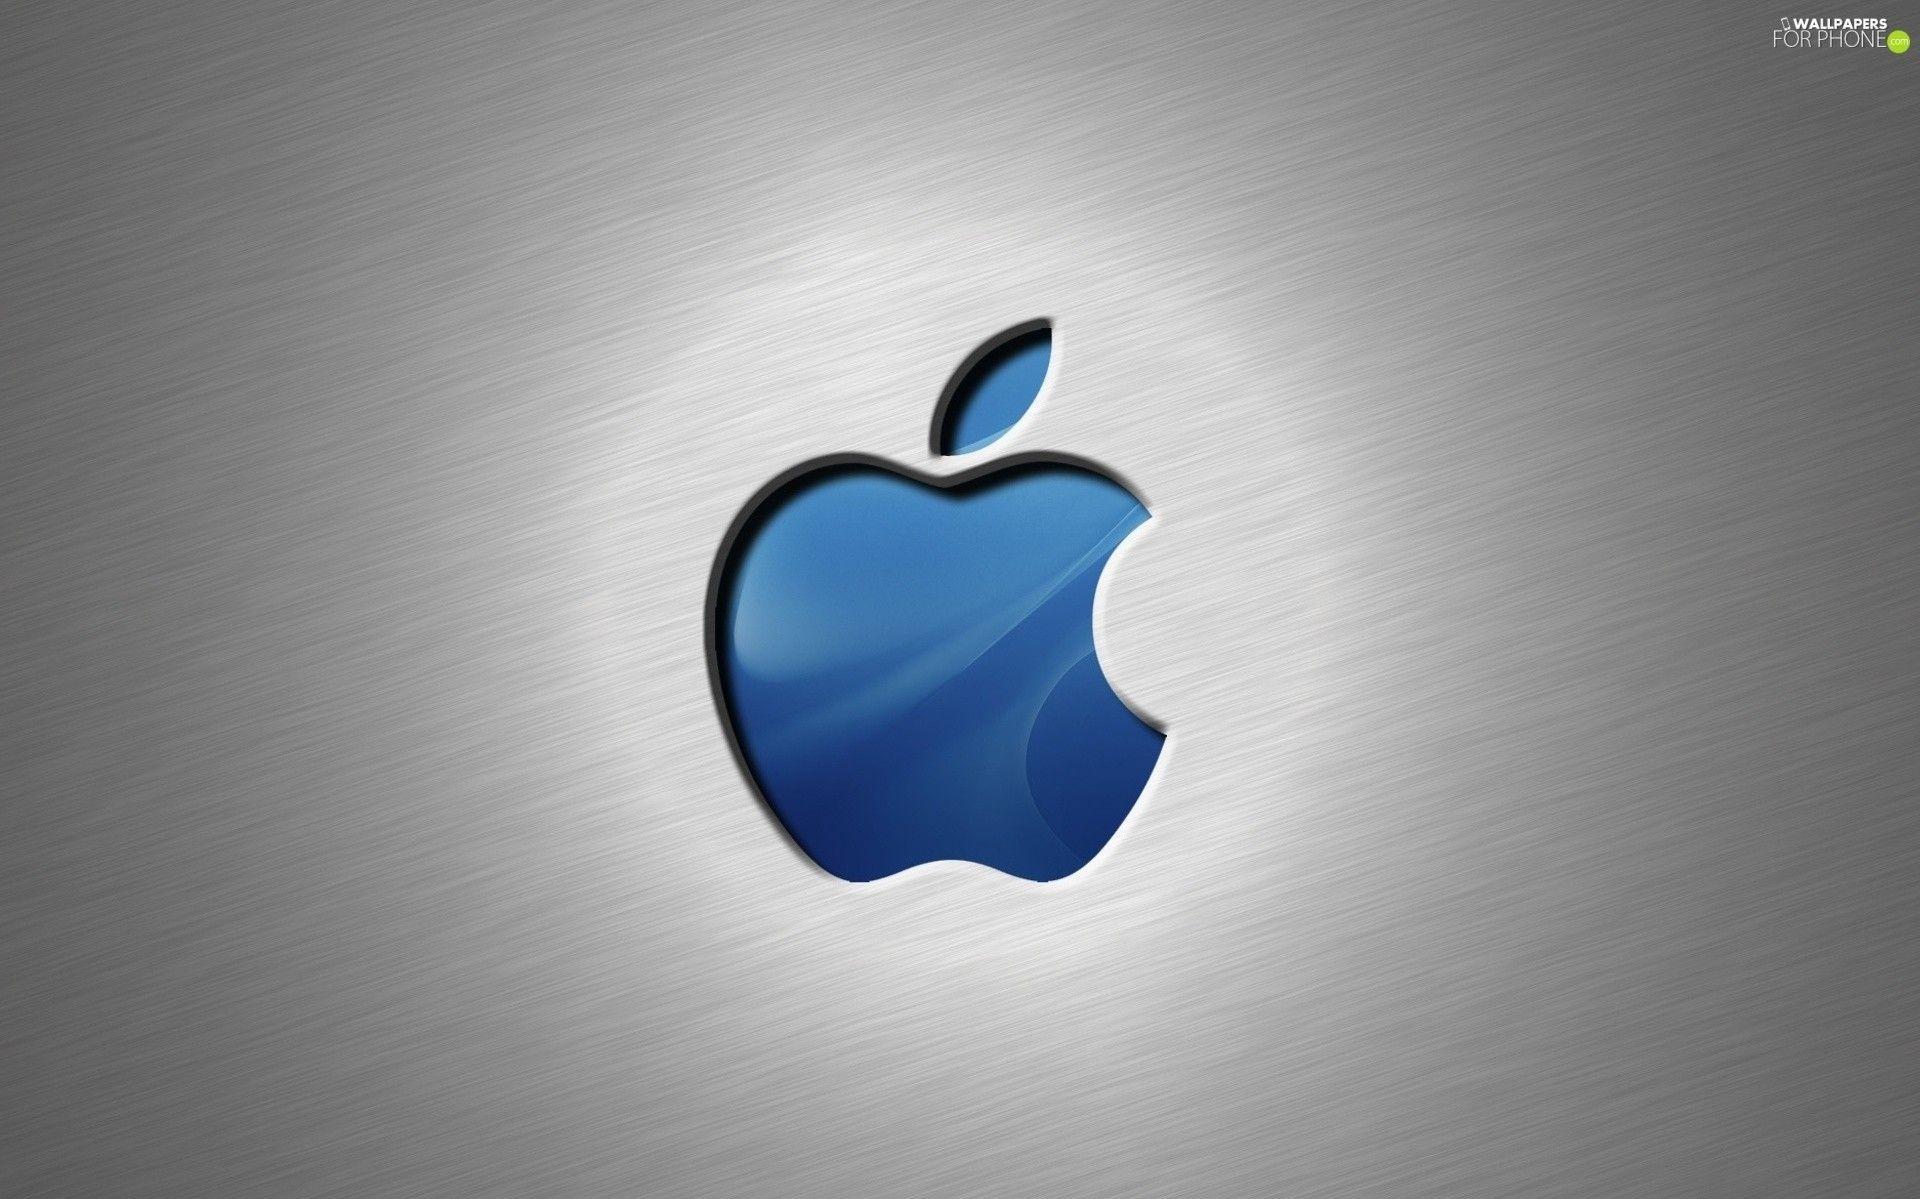 Pin by Akalantari on Ryrfv Mac wallpaper, Iphone